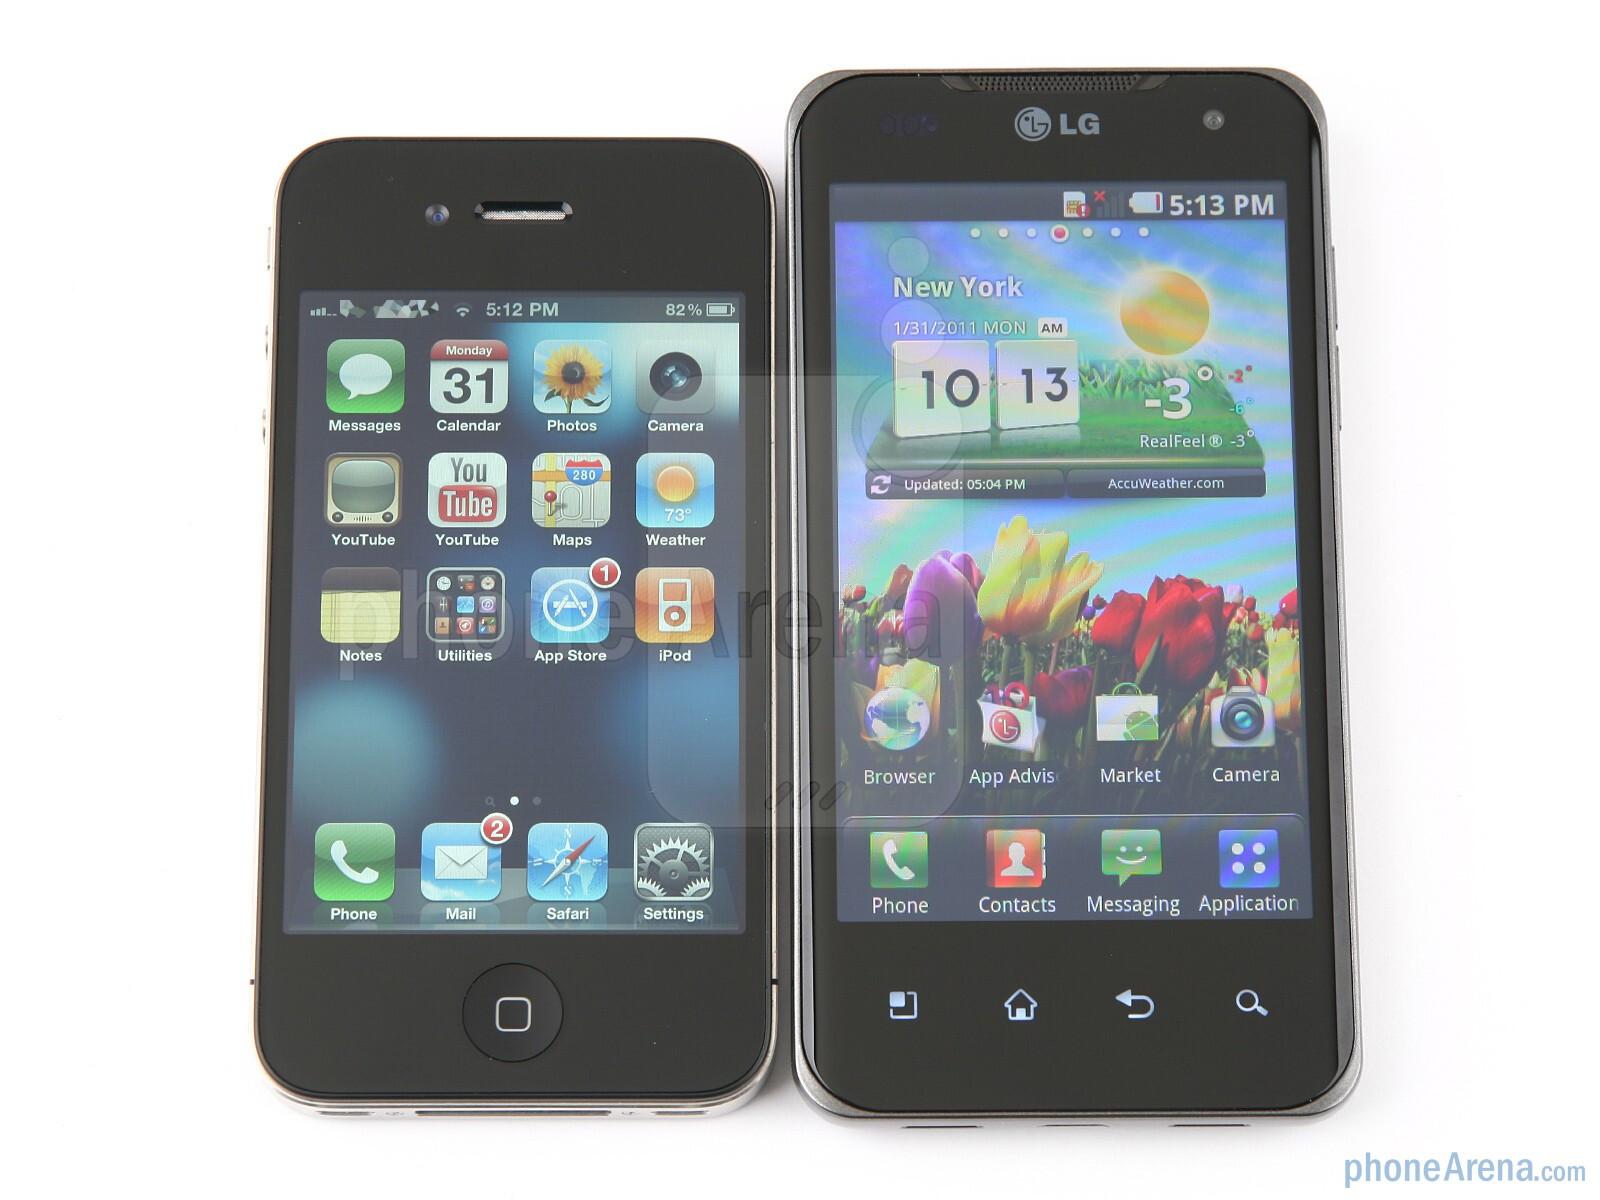 Quality of video: Apple iPhone 4 vs. LG Optimus speed